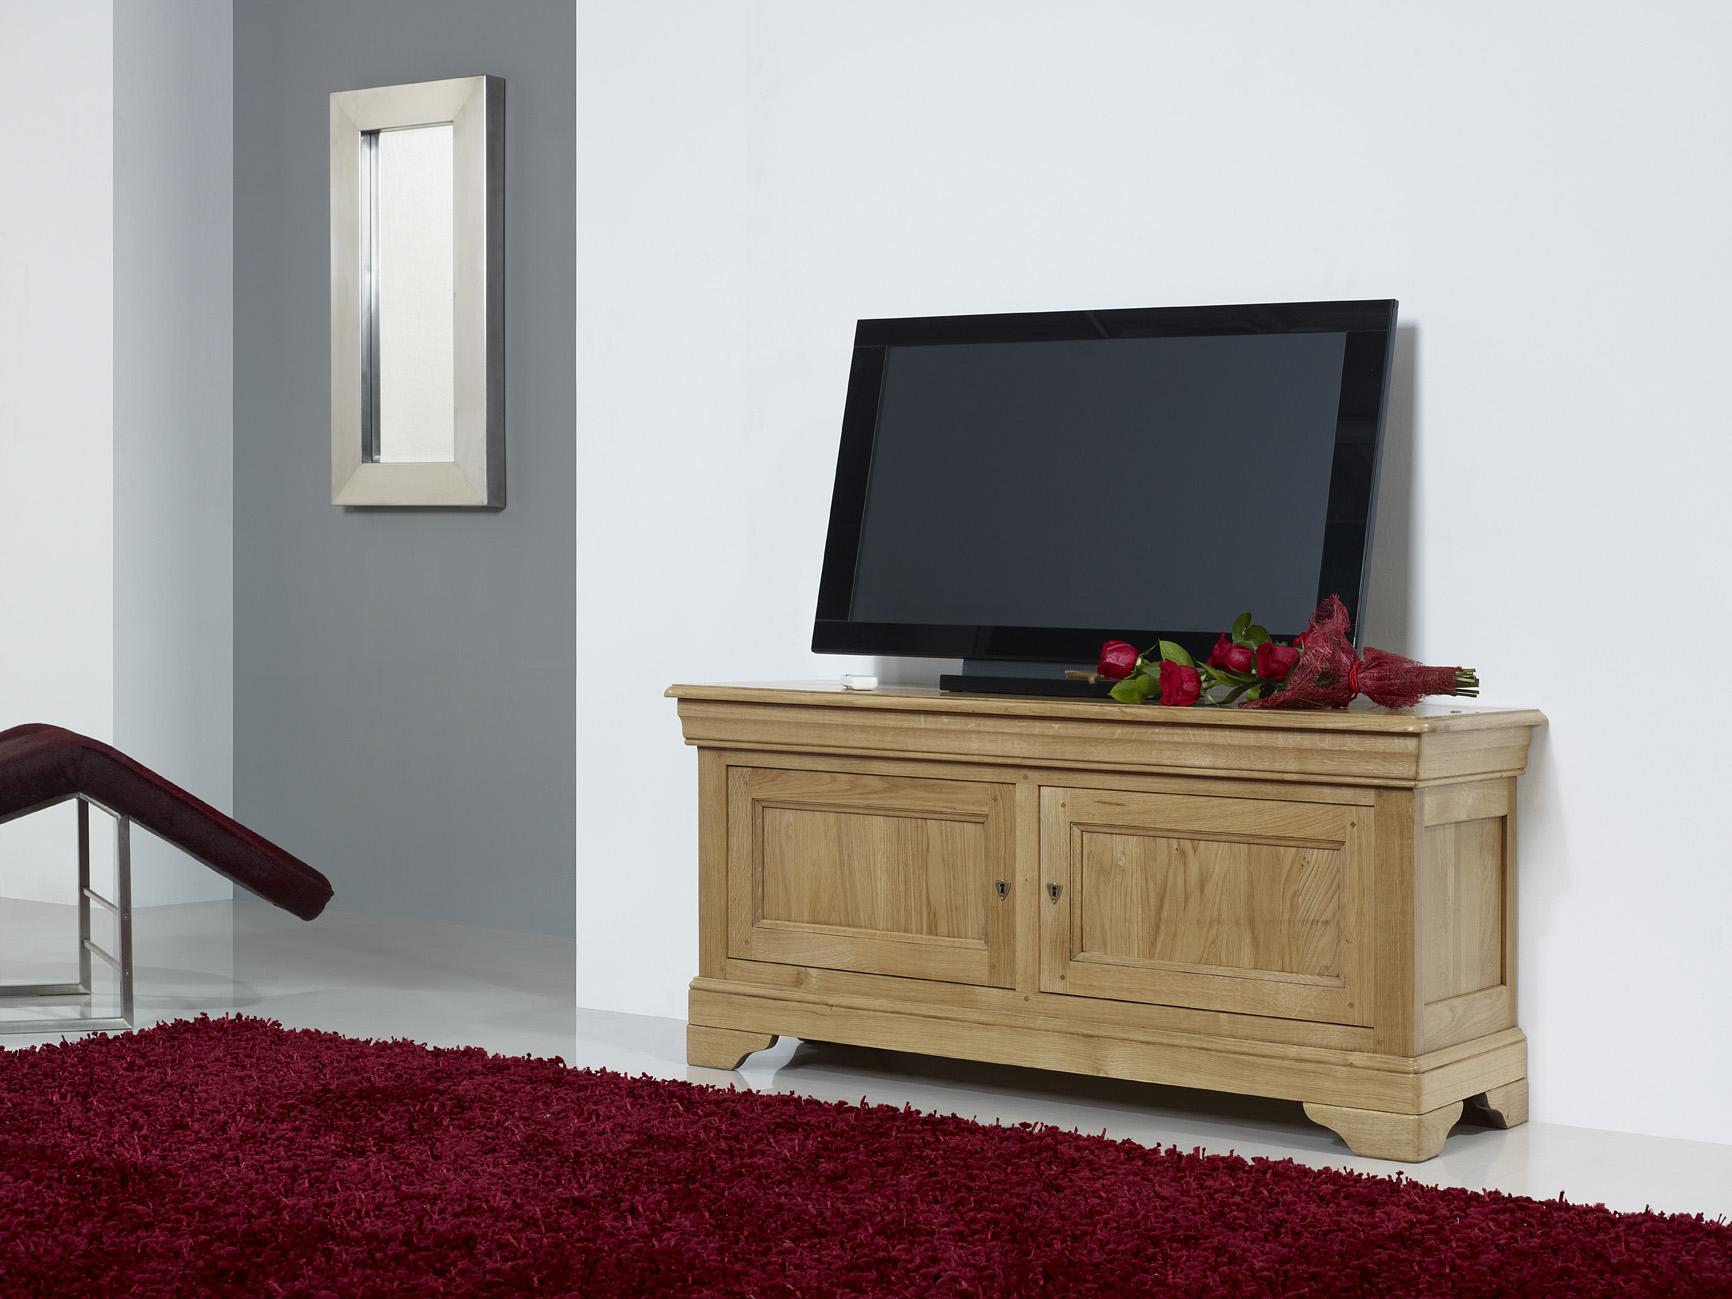 Meuble tv 16 9 me herv en ch ne massif de style louis philippe meuble en ch ne massif - Meuble tv style louis philippe ...